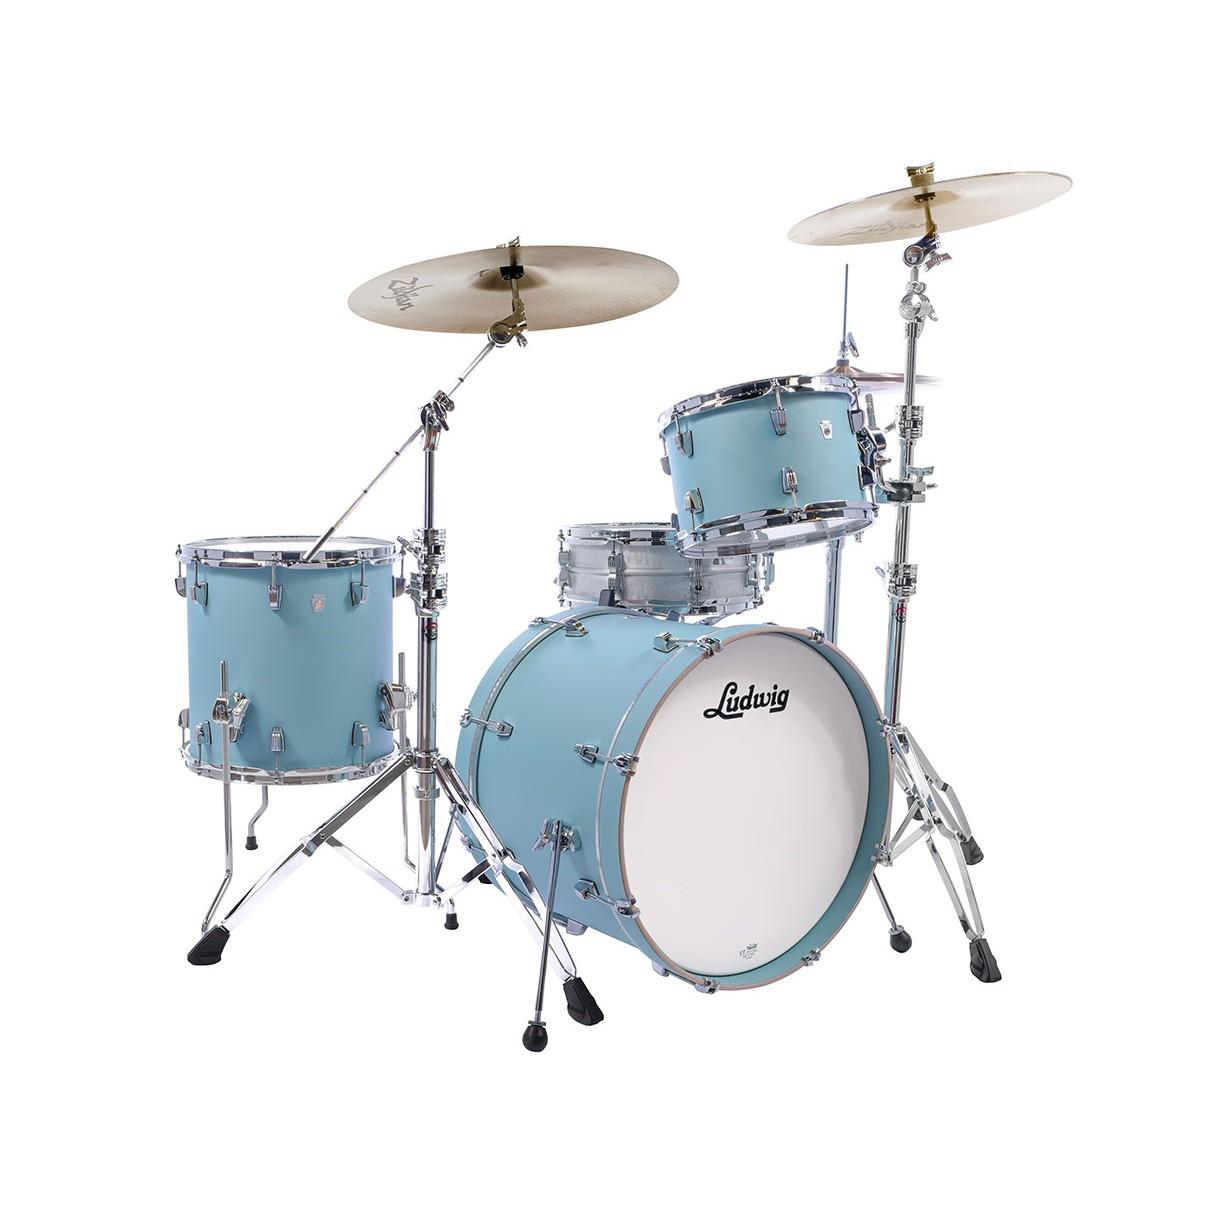 ludwig neusonic drum set skyline blue. Black Bedroom Furniture Sets. Home Design Ideas